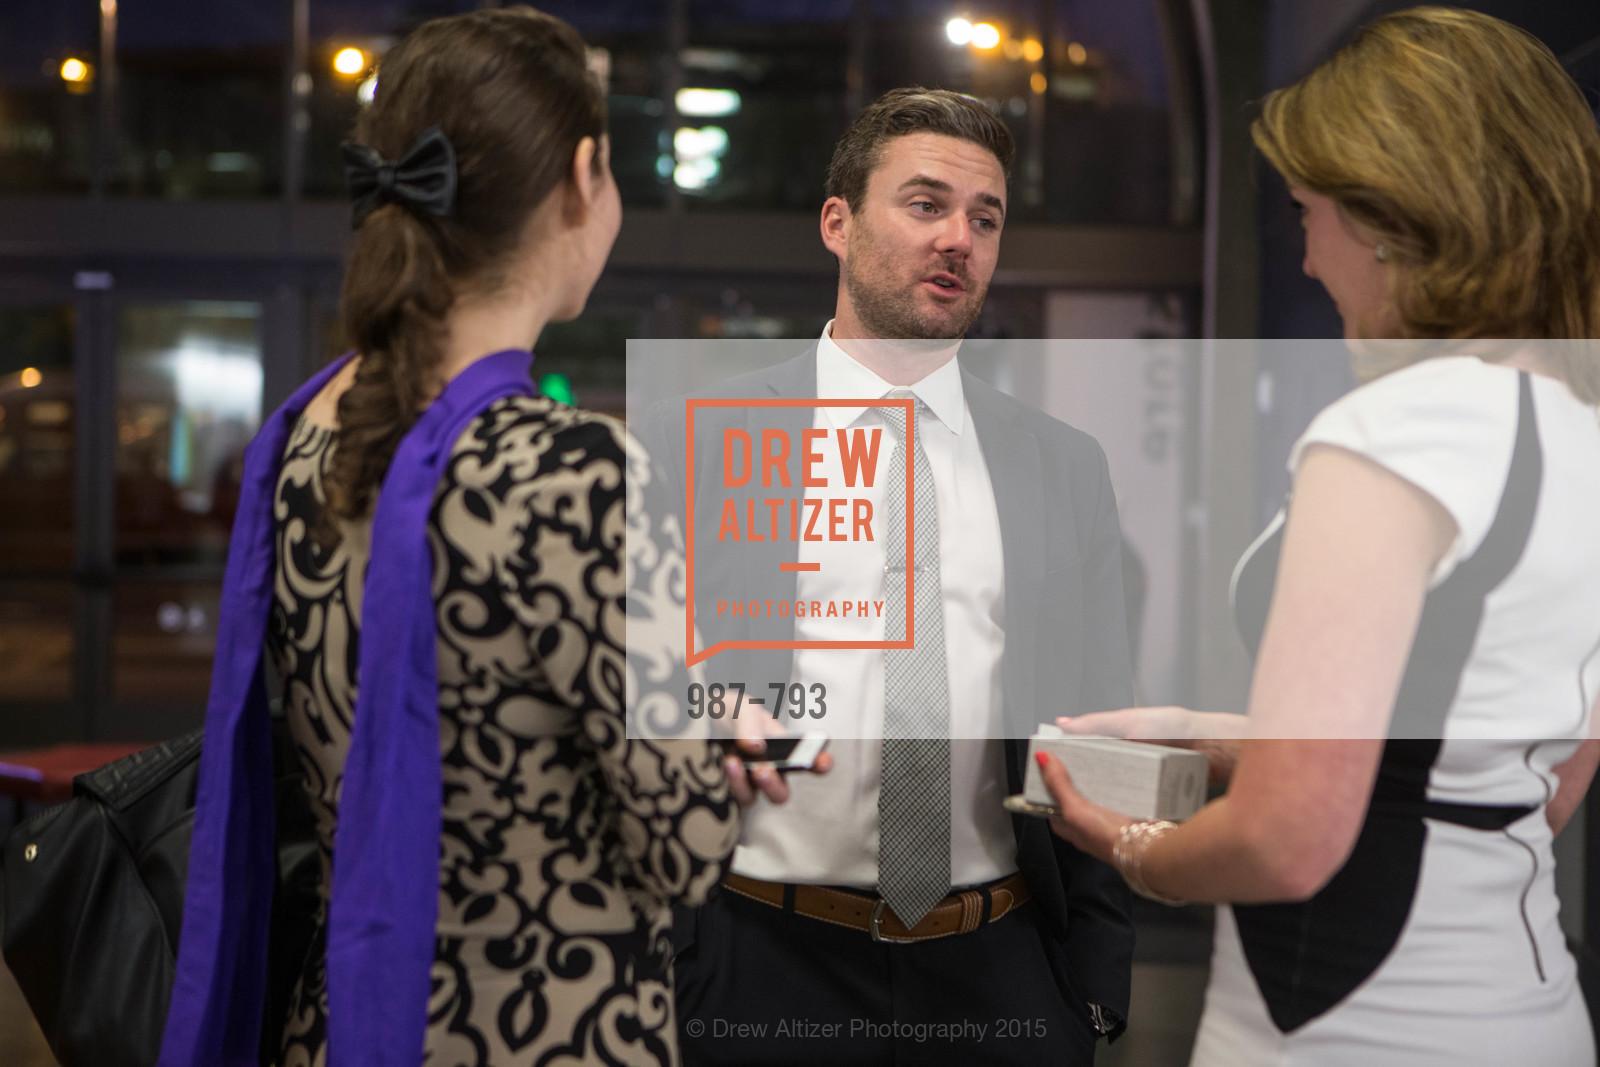 Benjamin Osgood, SF BRAVO CLUB Sneak Peek at the EXPLORATORIUM, US, April 23rd, 2015,Drew Altizer, Drew Altizer Photography, full-service agency, private events, San Francisco photographer, photographer california